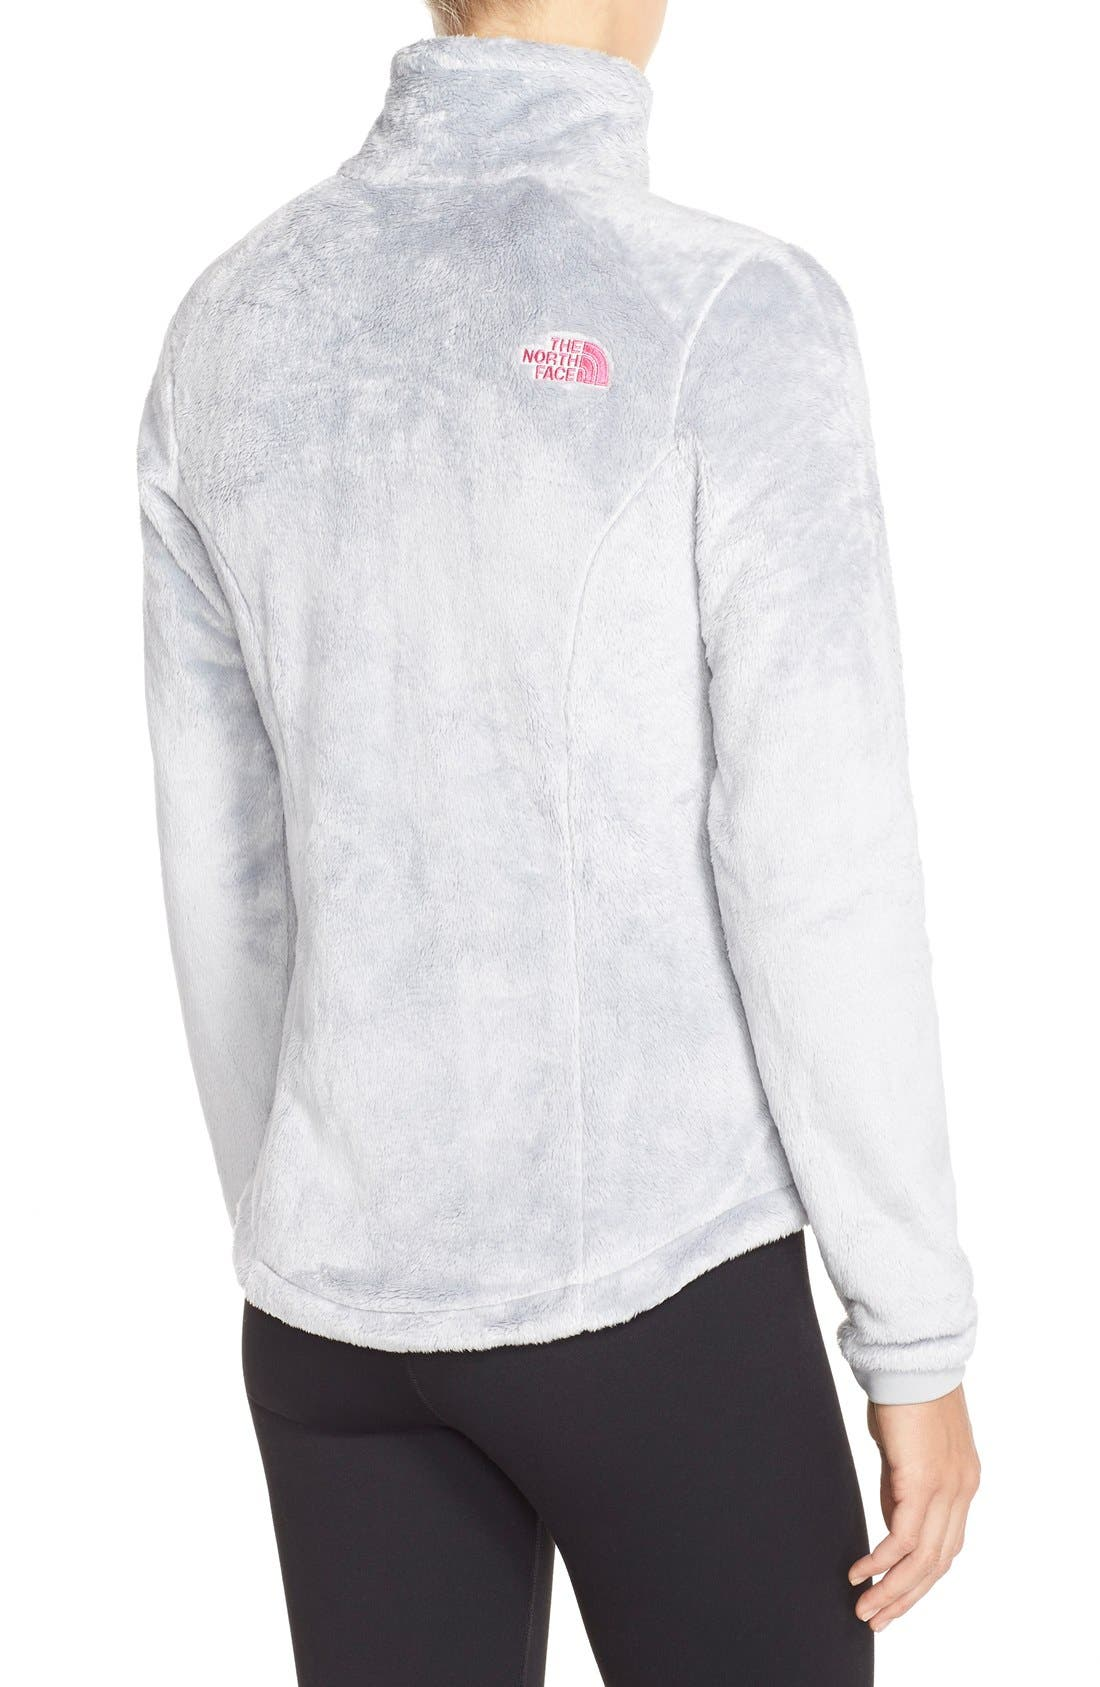 THE NORTH FACE, 'Osito 2 - Pink Ribbon' Fleece Jacket, Alternate thumbnail 4, color, 030